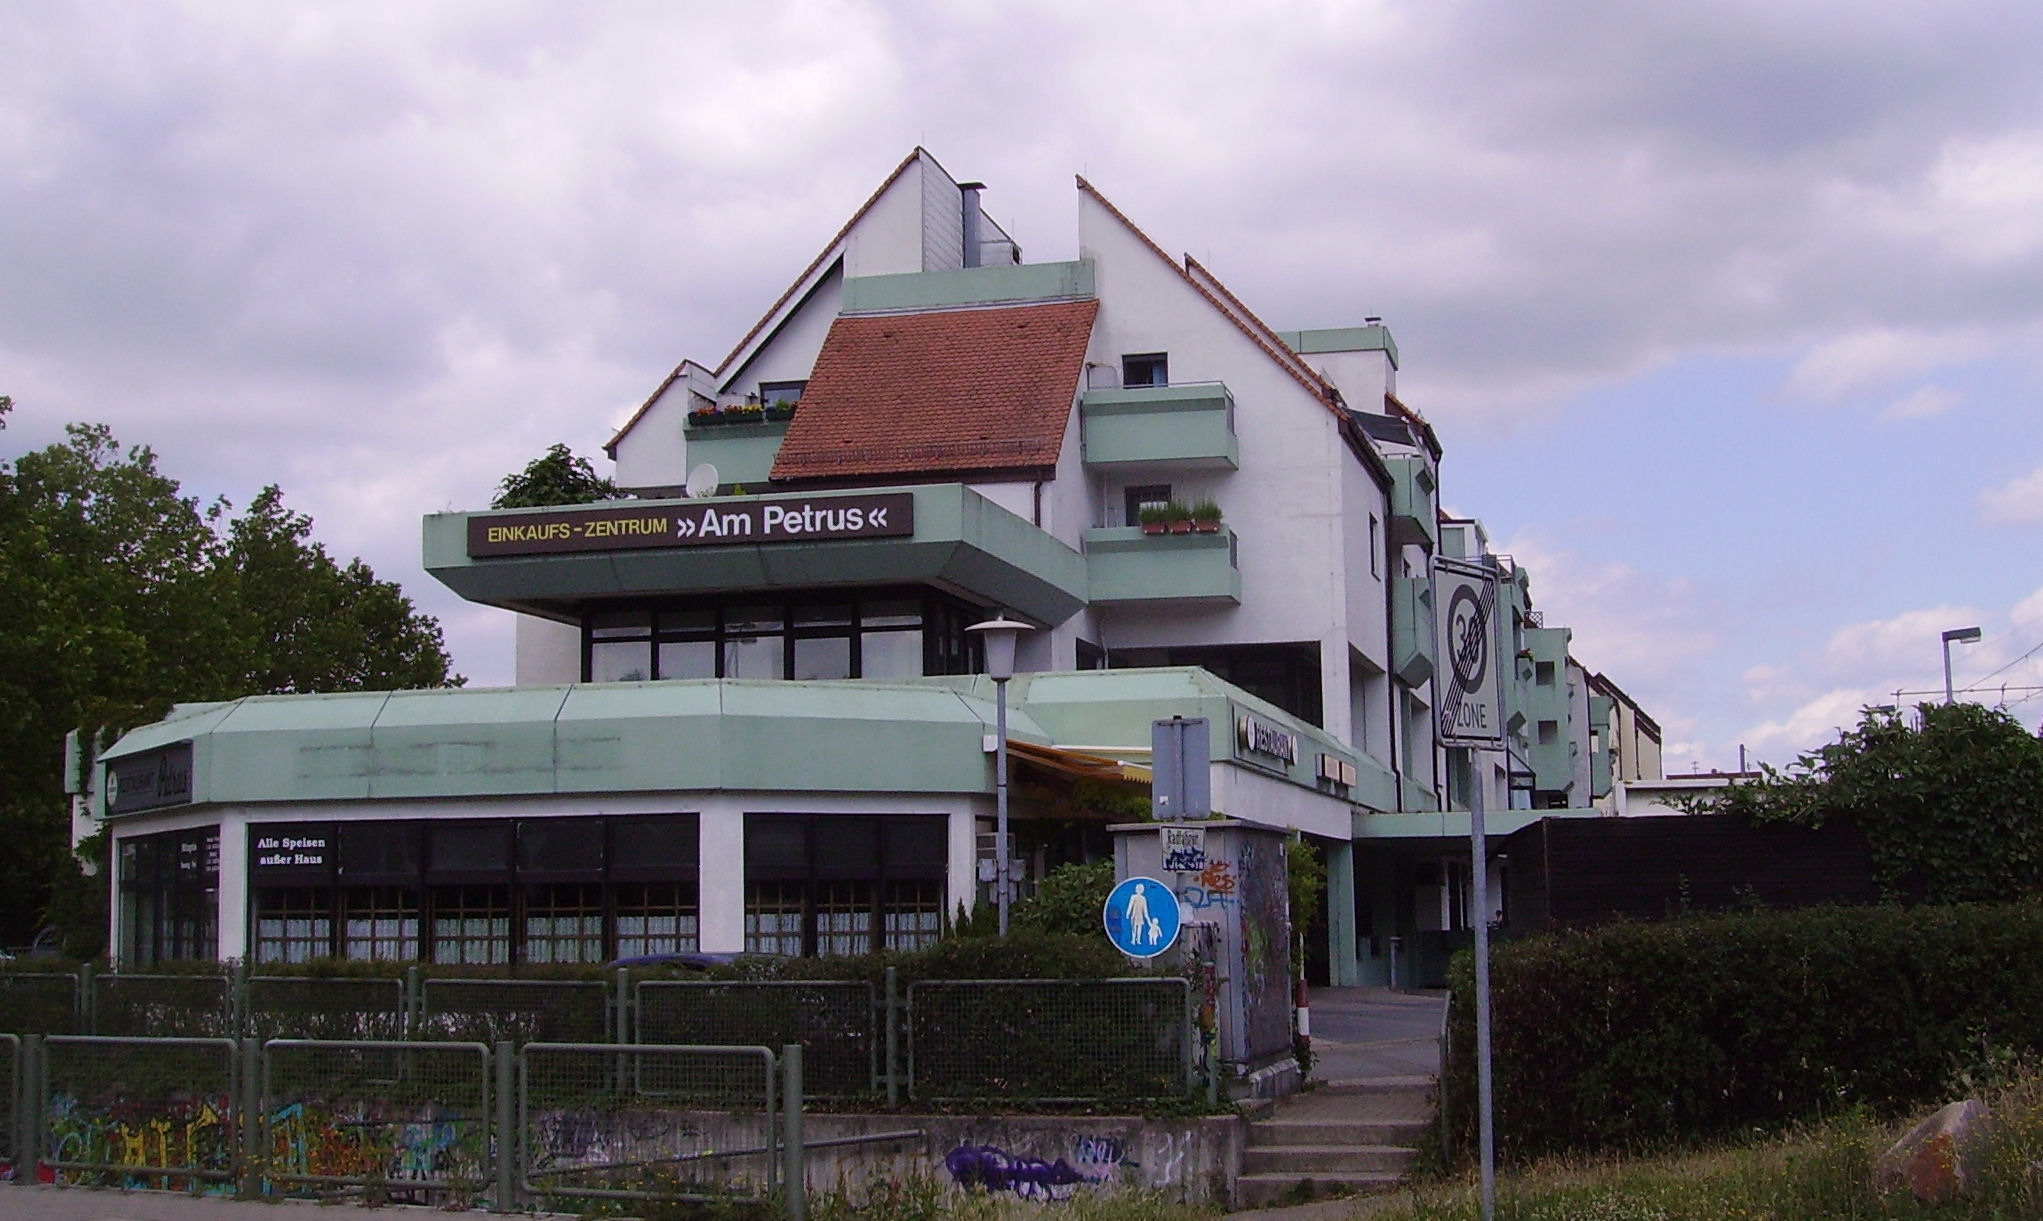 Dossenheim Germany  city pictures gallery : Am Petrus Dossenheim 01 Wikimedia Commons